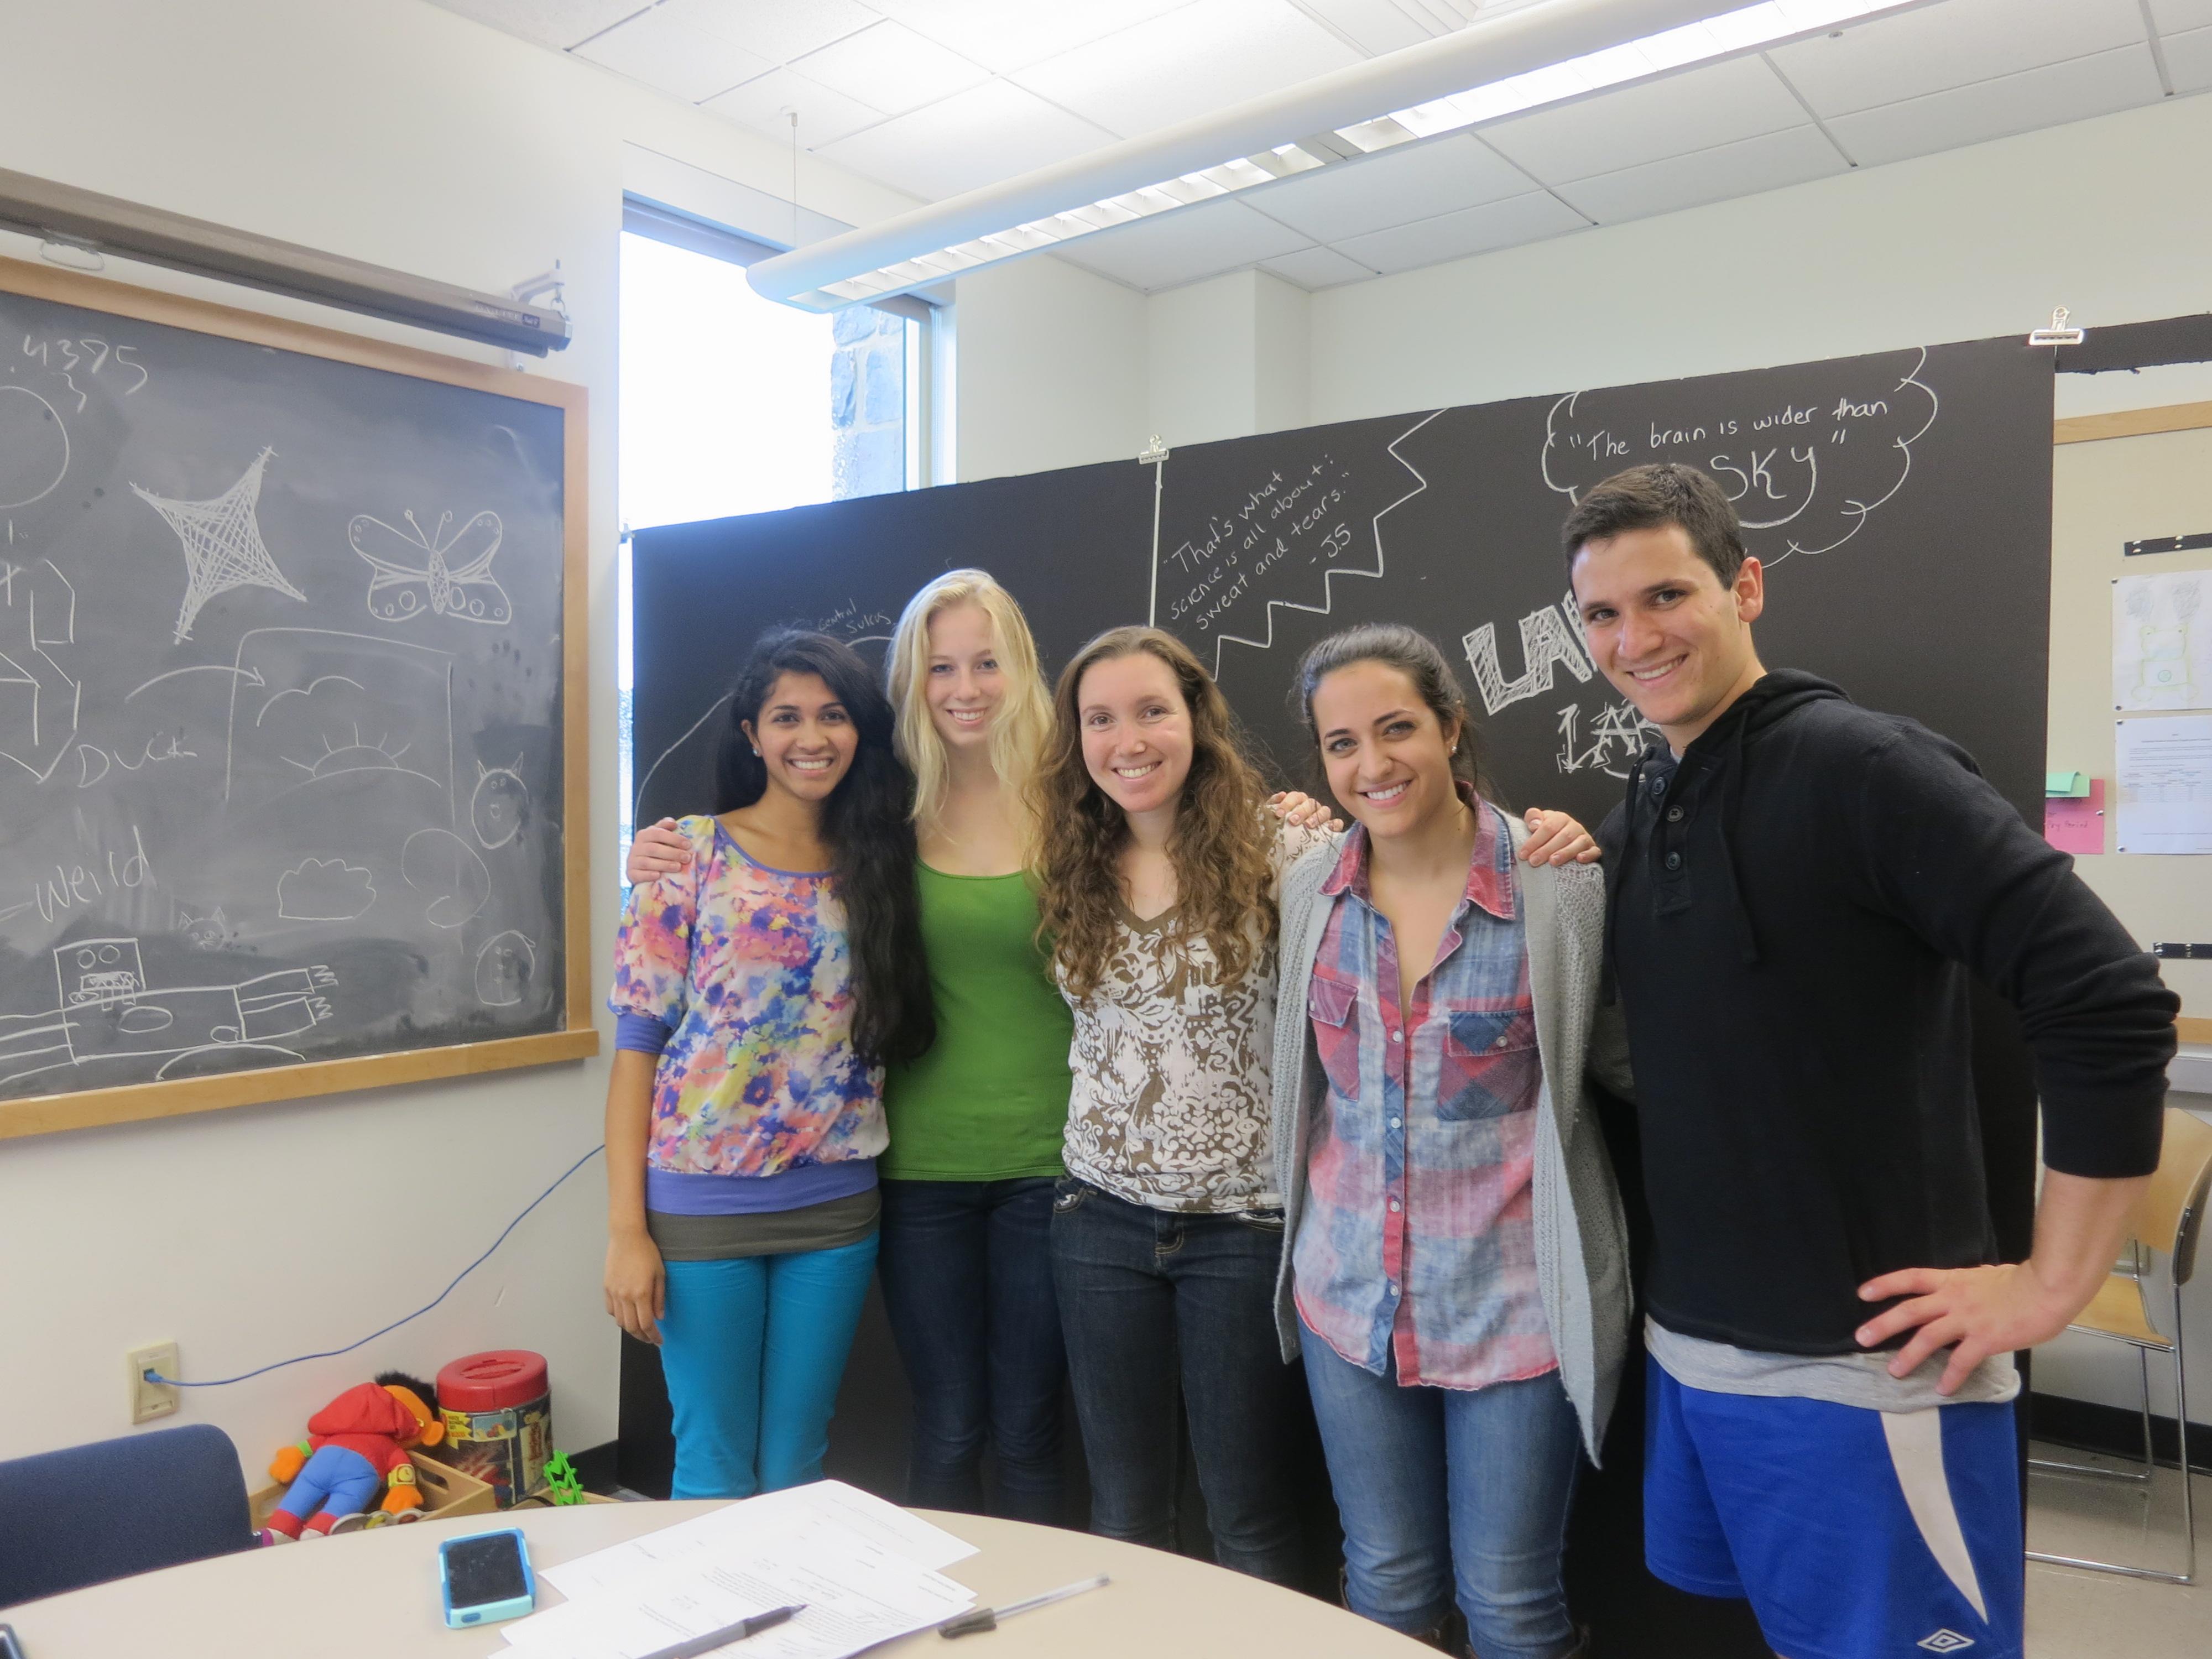 Sandhya Rao '15, Gretchen Walker '14, Rebecca Gaines '15, Sarah Mehrotra '14, Noah Levinson '14.